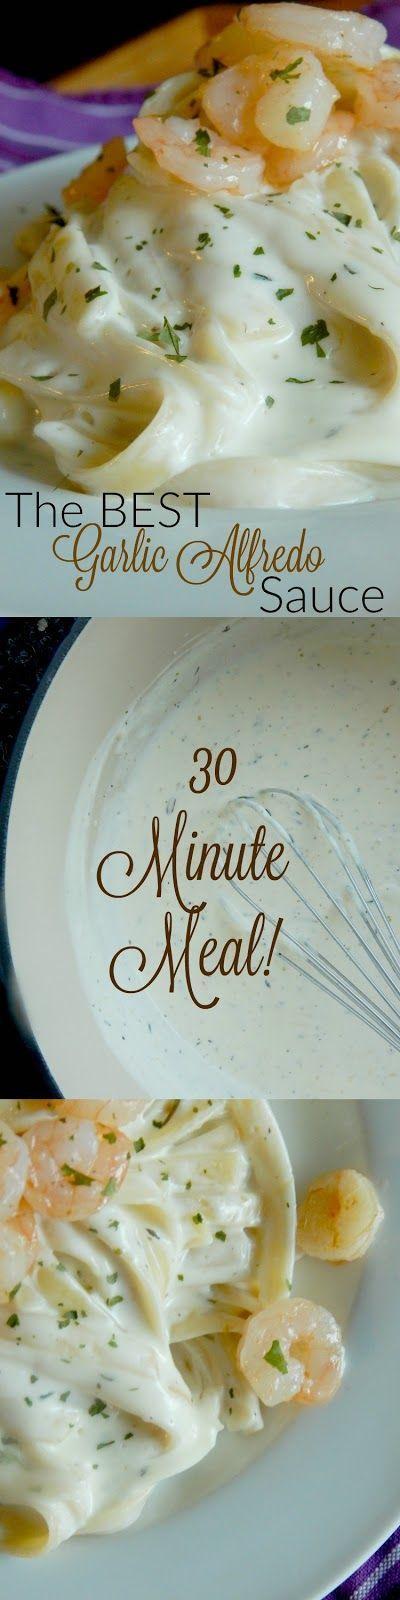 the best garlic alfredo sauce (http://sweetandsavoryfood.com)